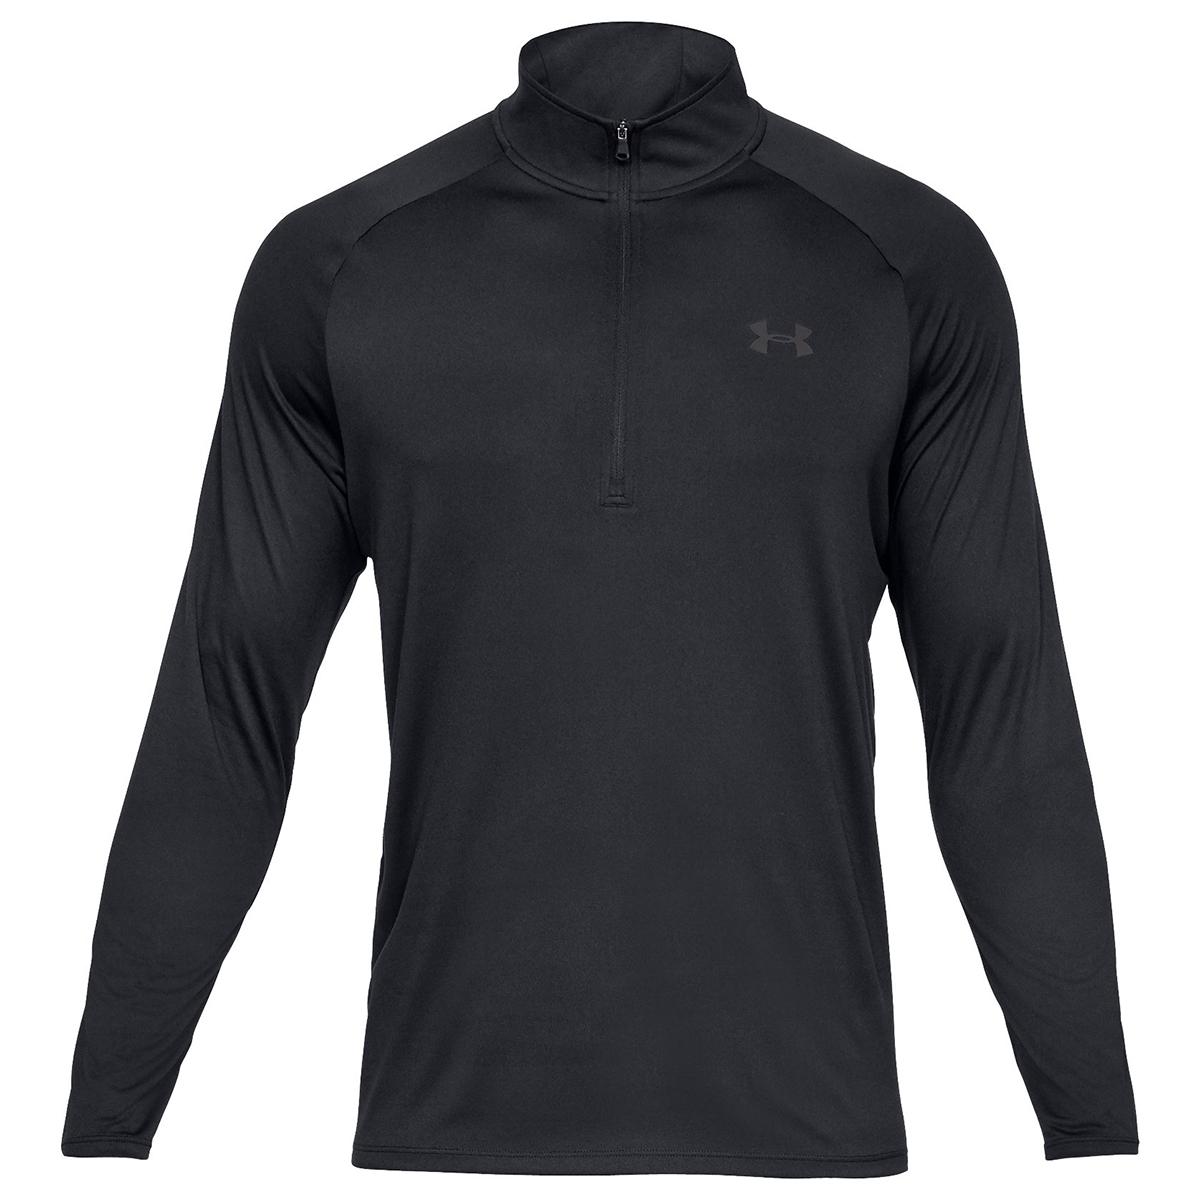 Under Armour Men's Ua Tech Half Zip Pullover - Black, 3XL